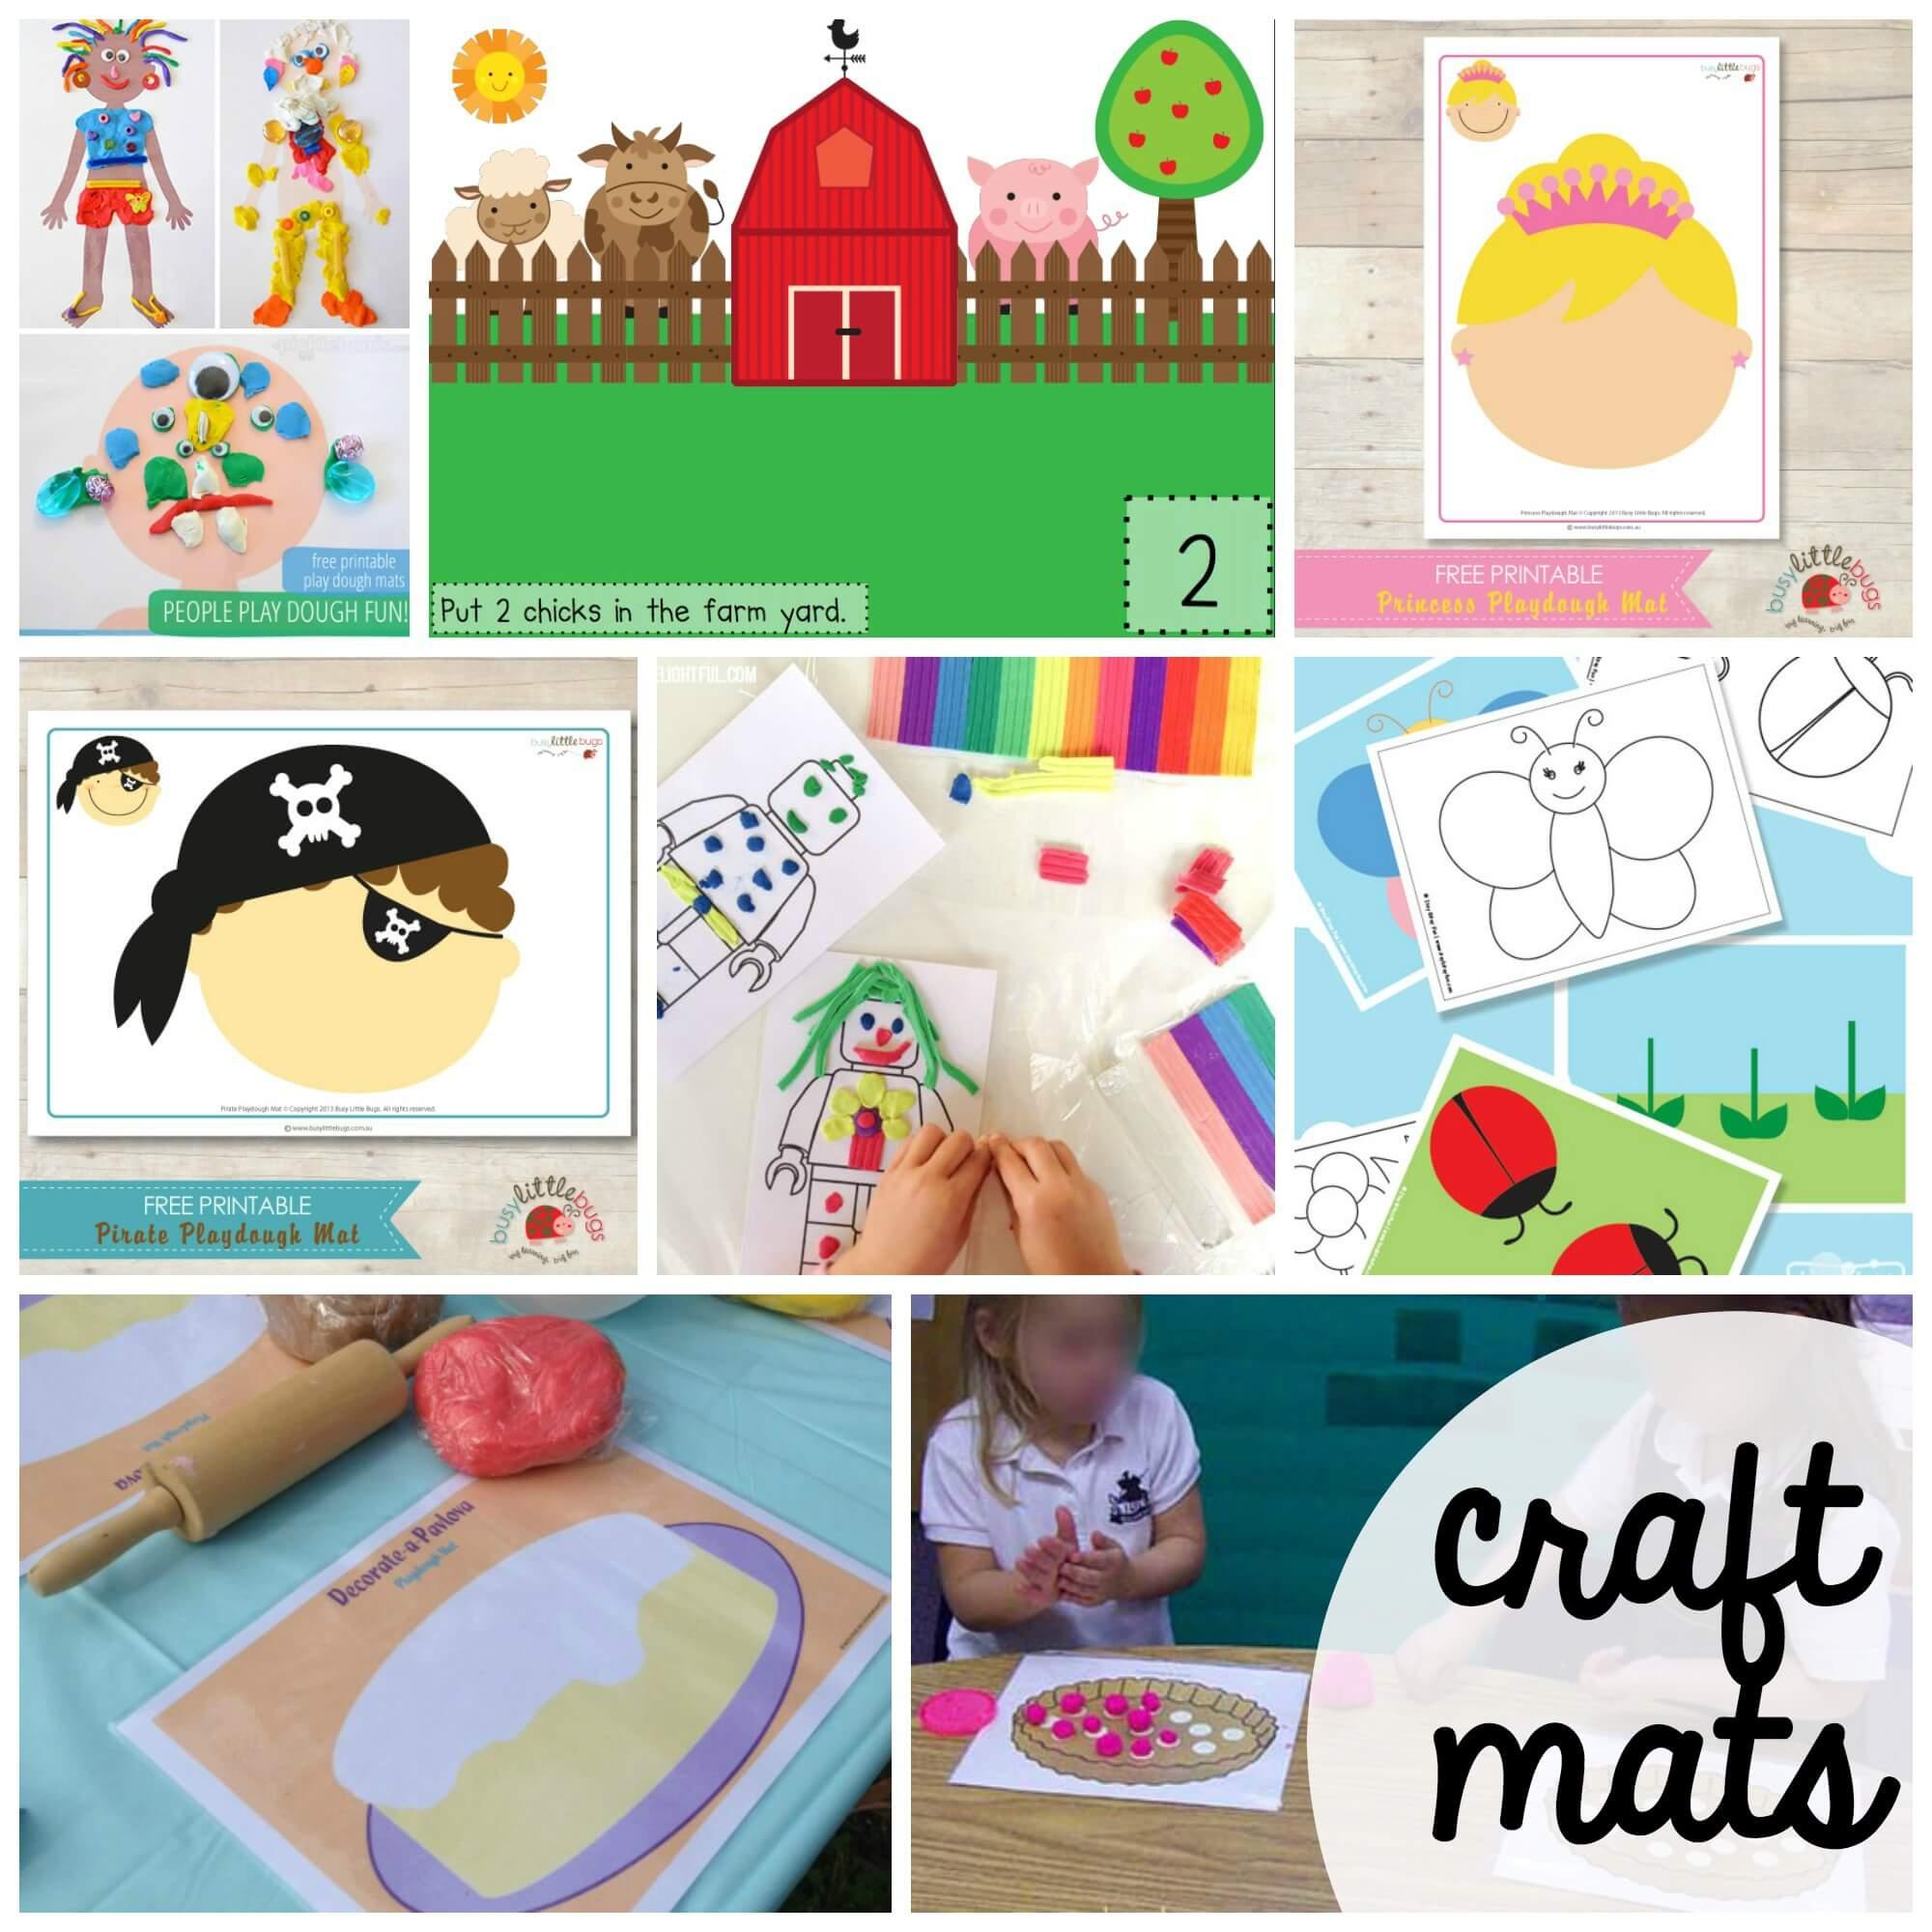 100 Free Playdough Mats - Playdough To Plato - Free Printable Playdough Mats